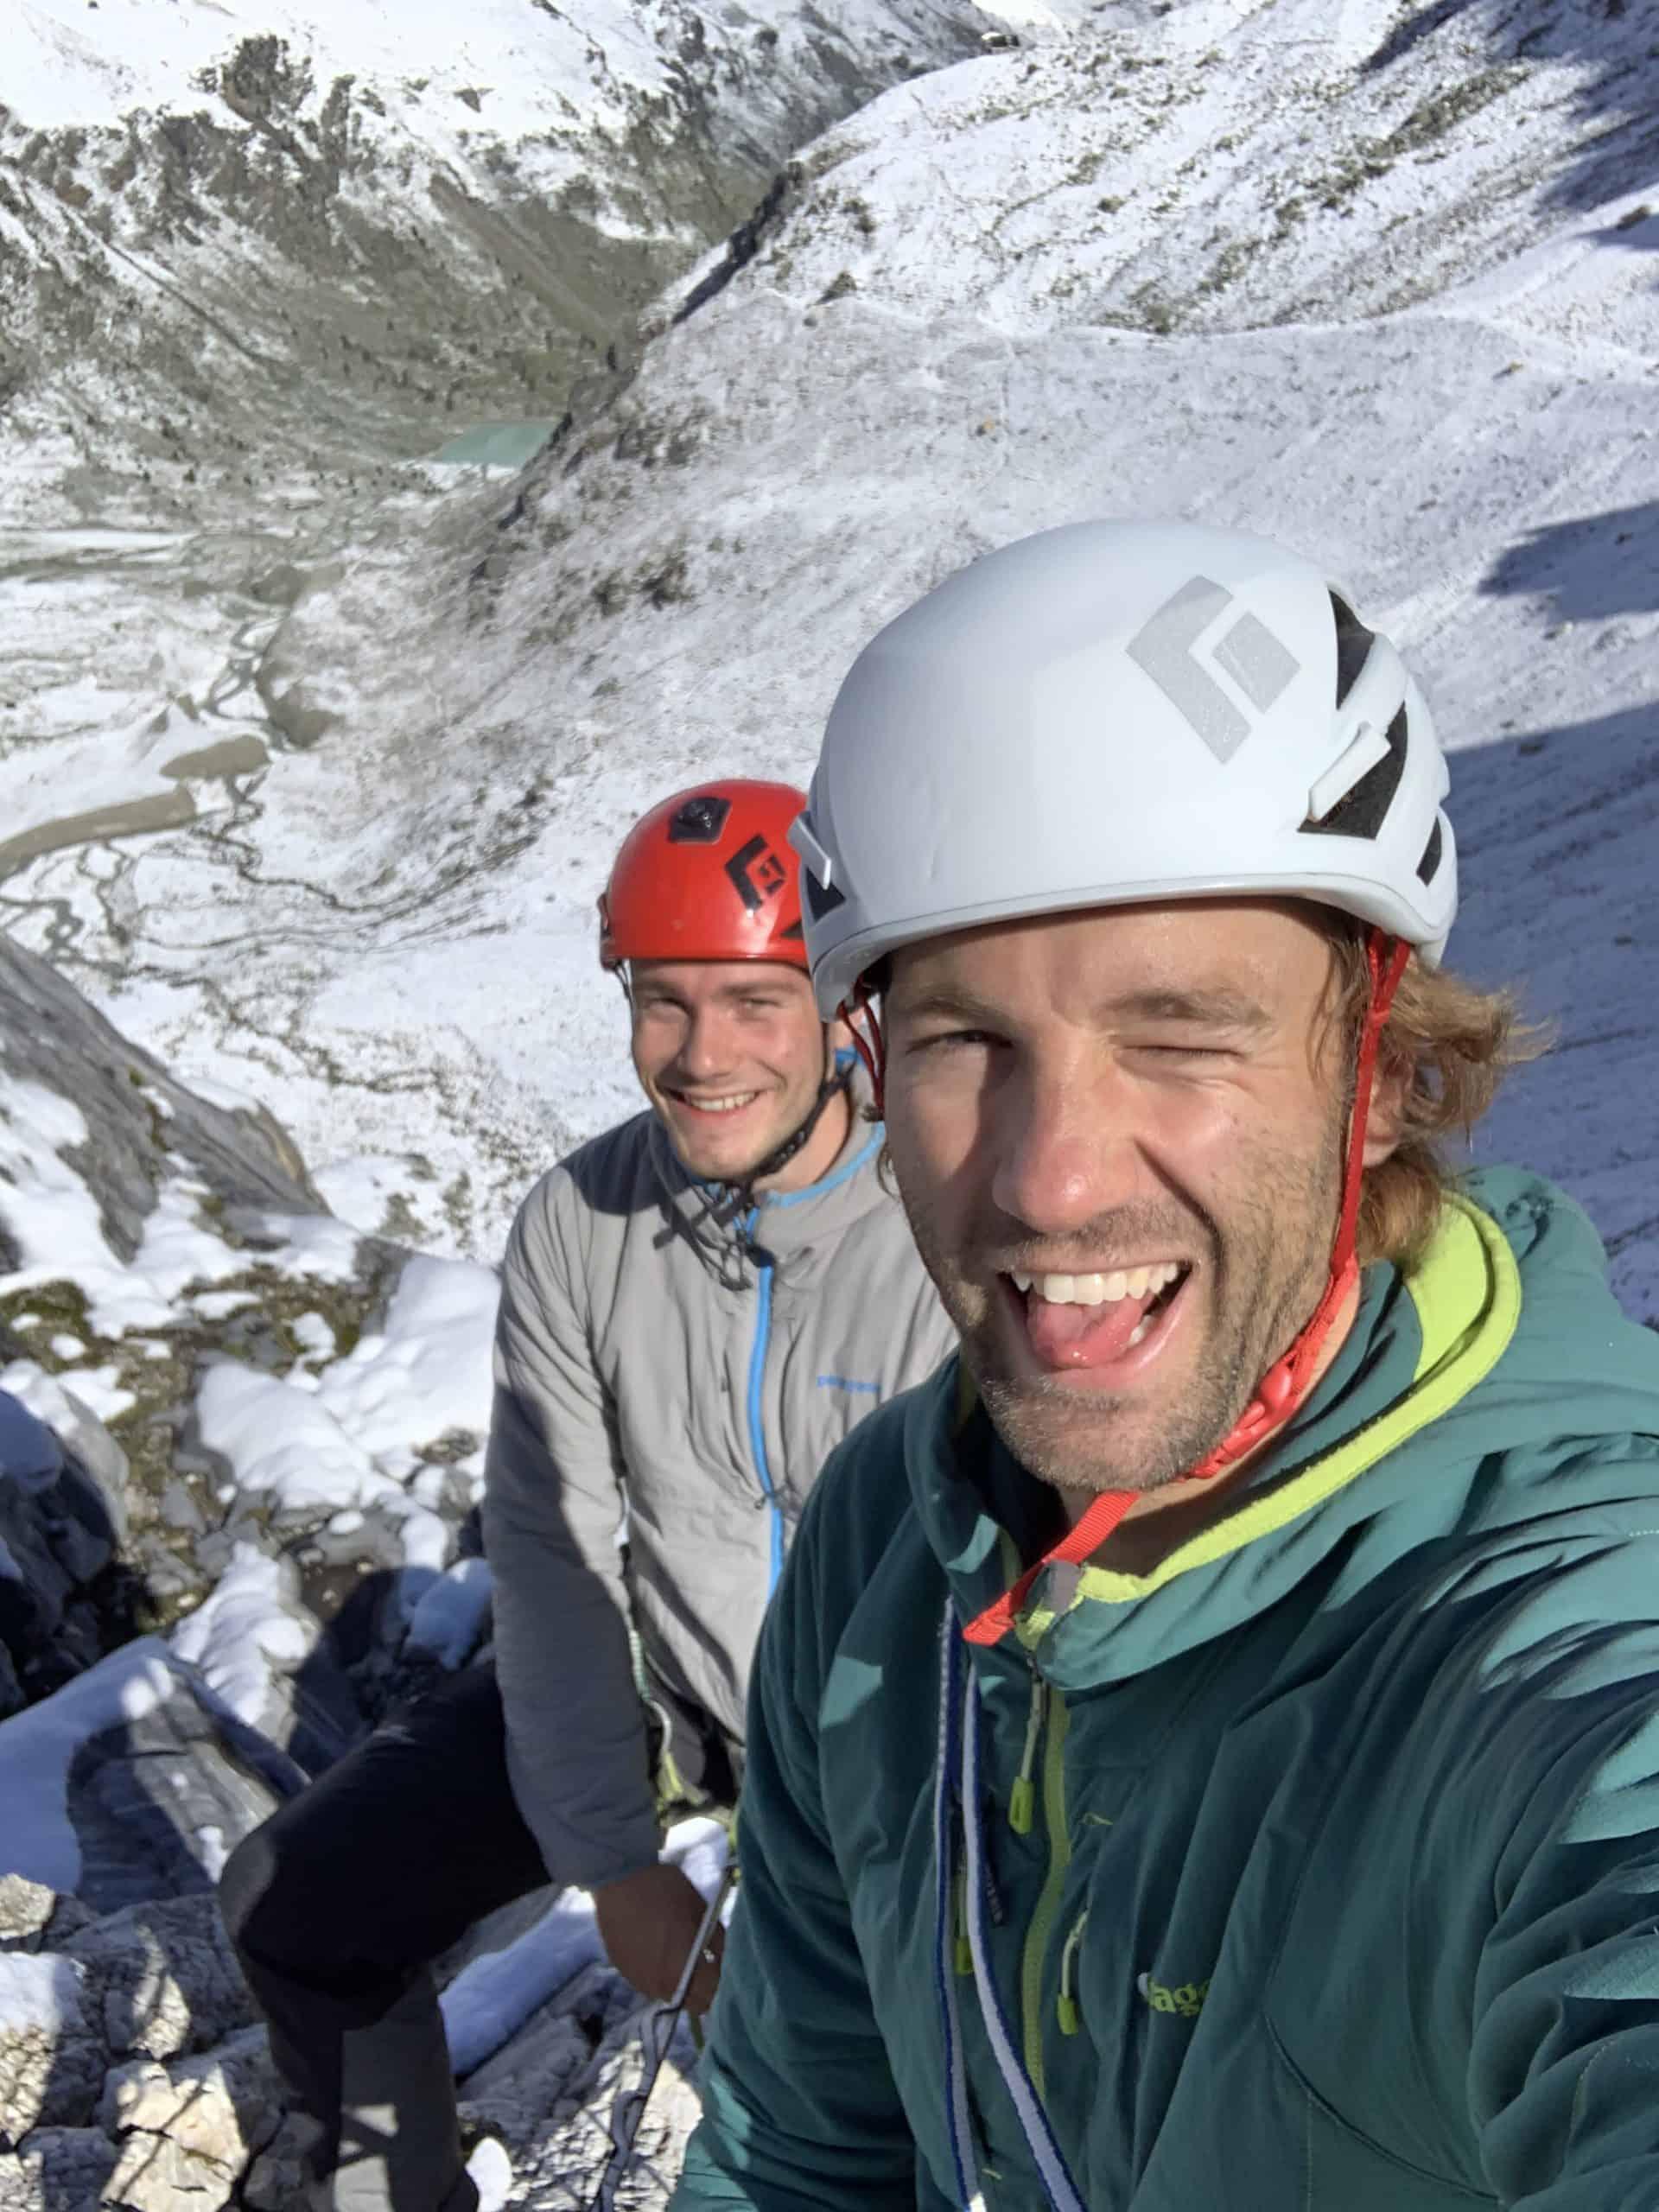 385B1686 EF67 4FBD 934A 55D3485F5F23 scaled - Turtmanntal - Klettern in den Alpen